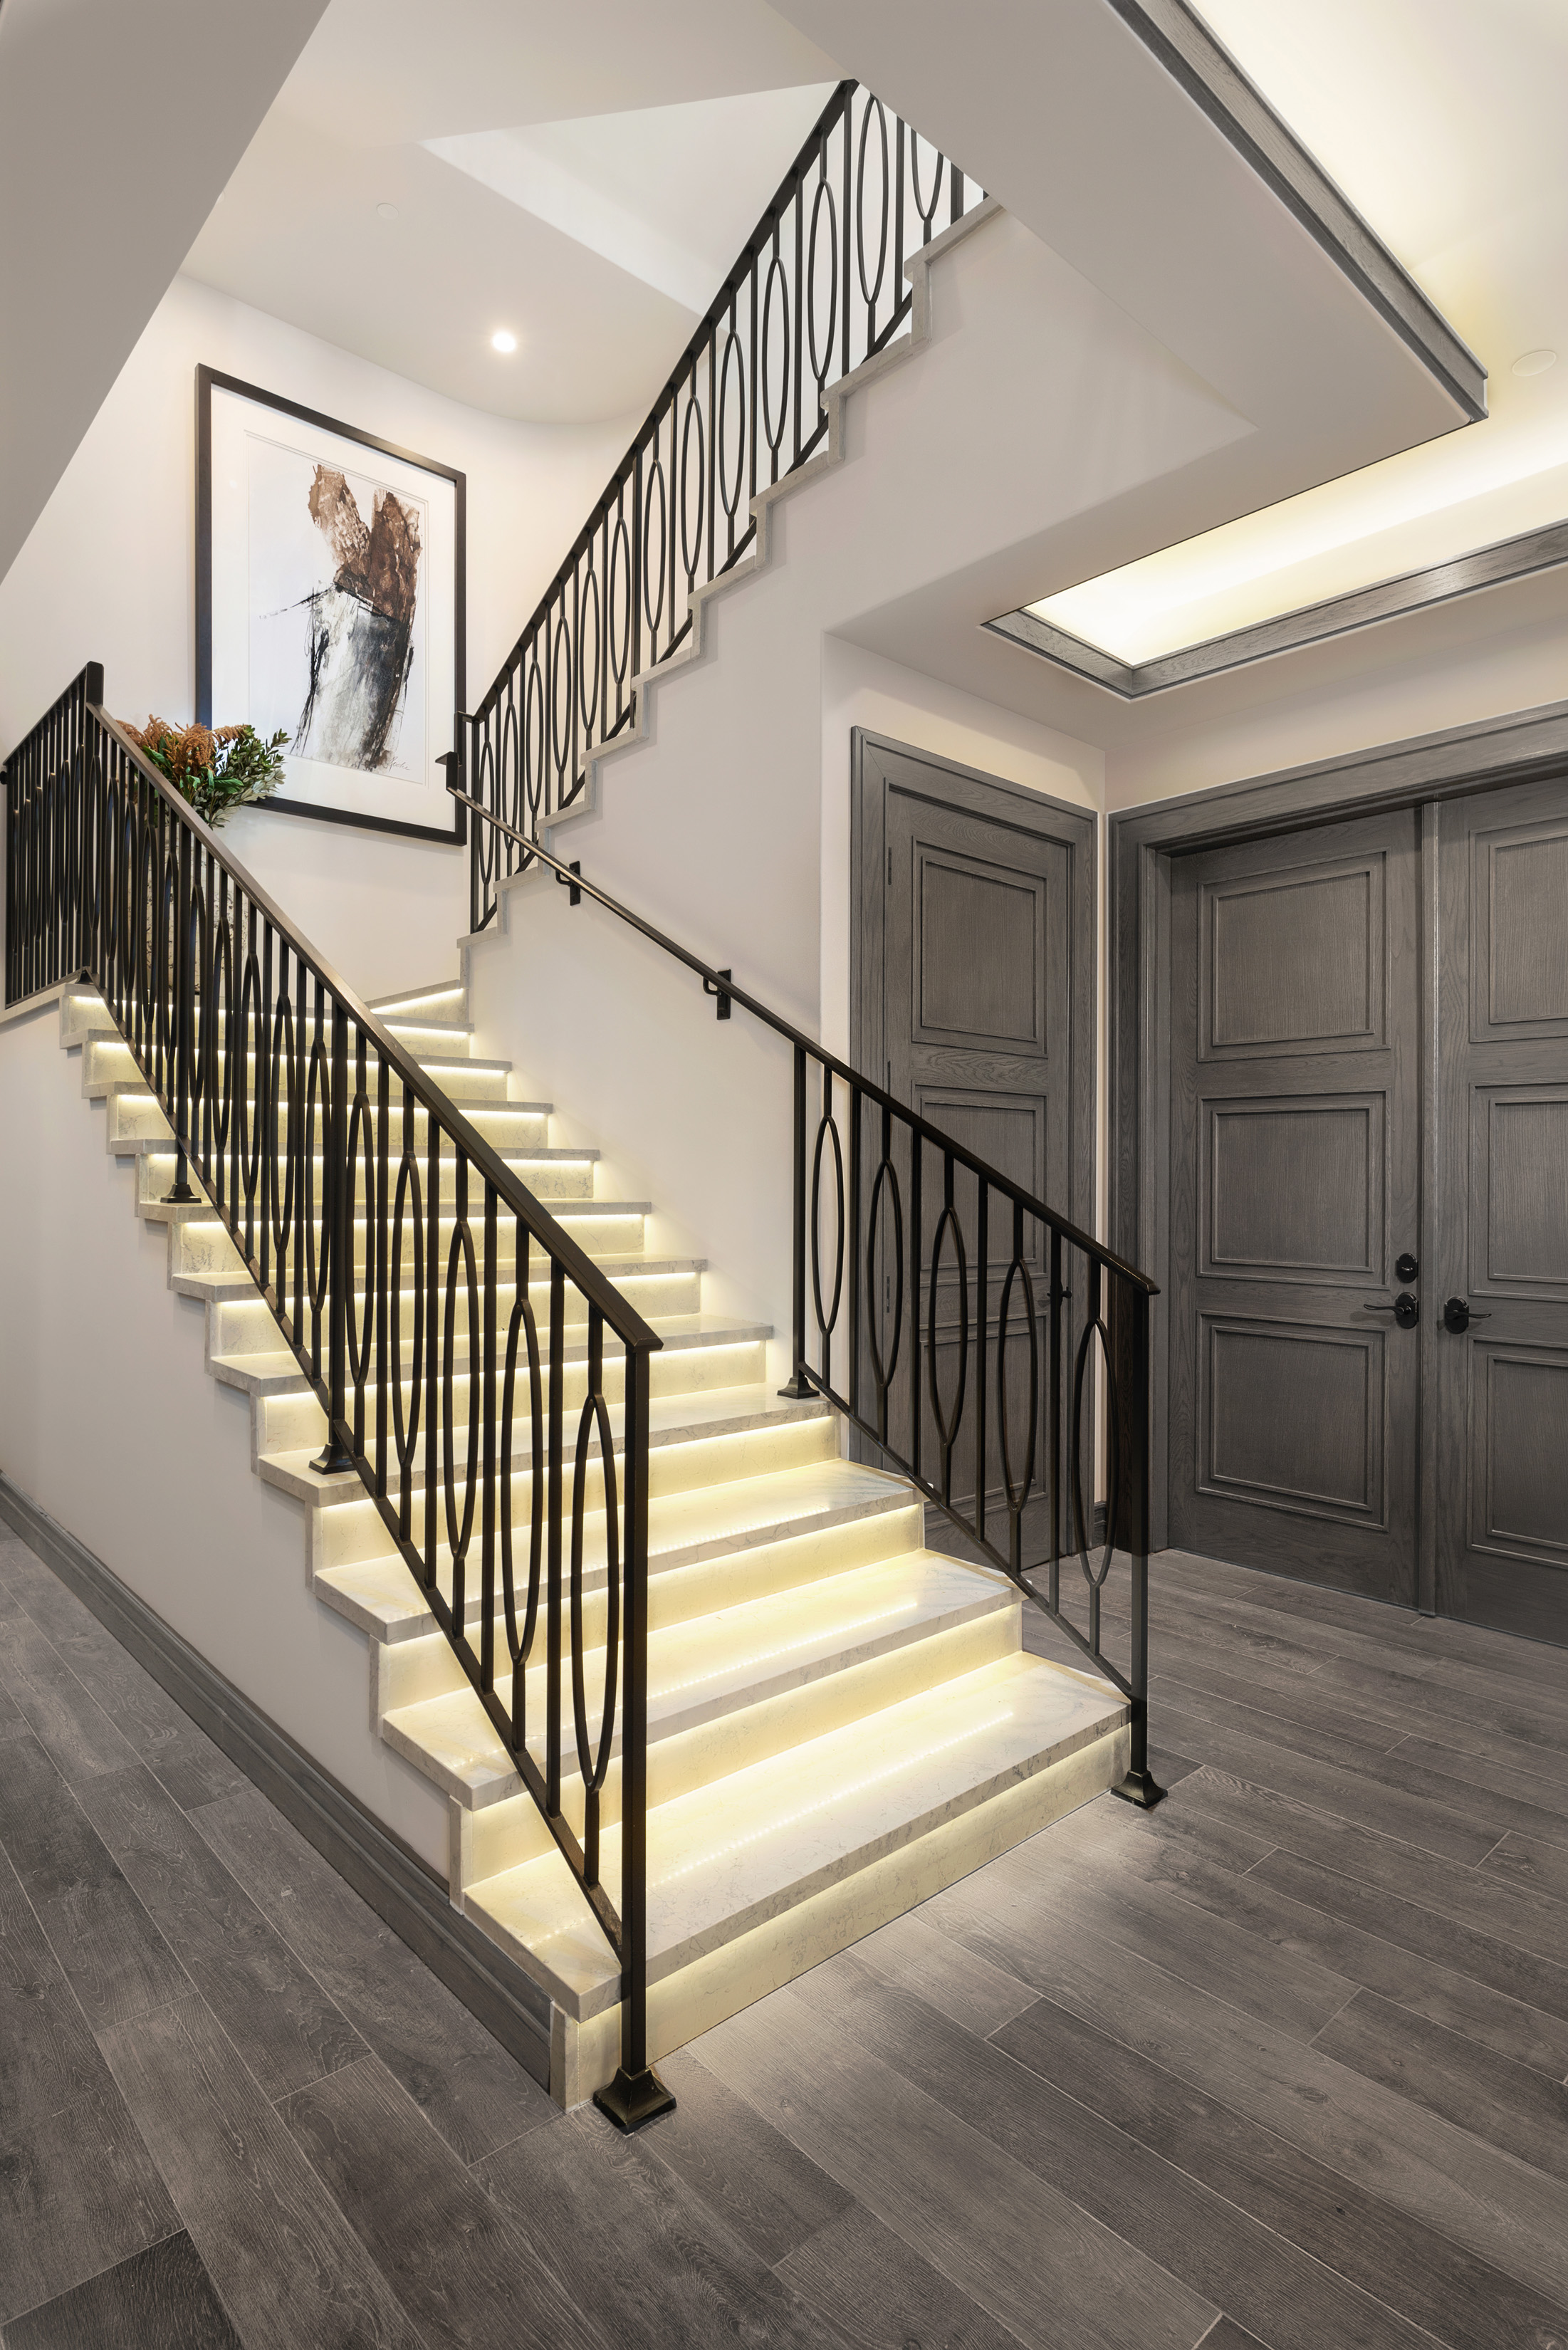 5CoralRidge_L2-Staircase-Plant_2461v-3300.jpg